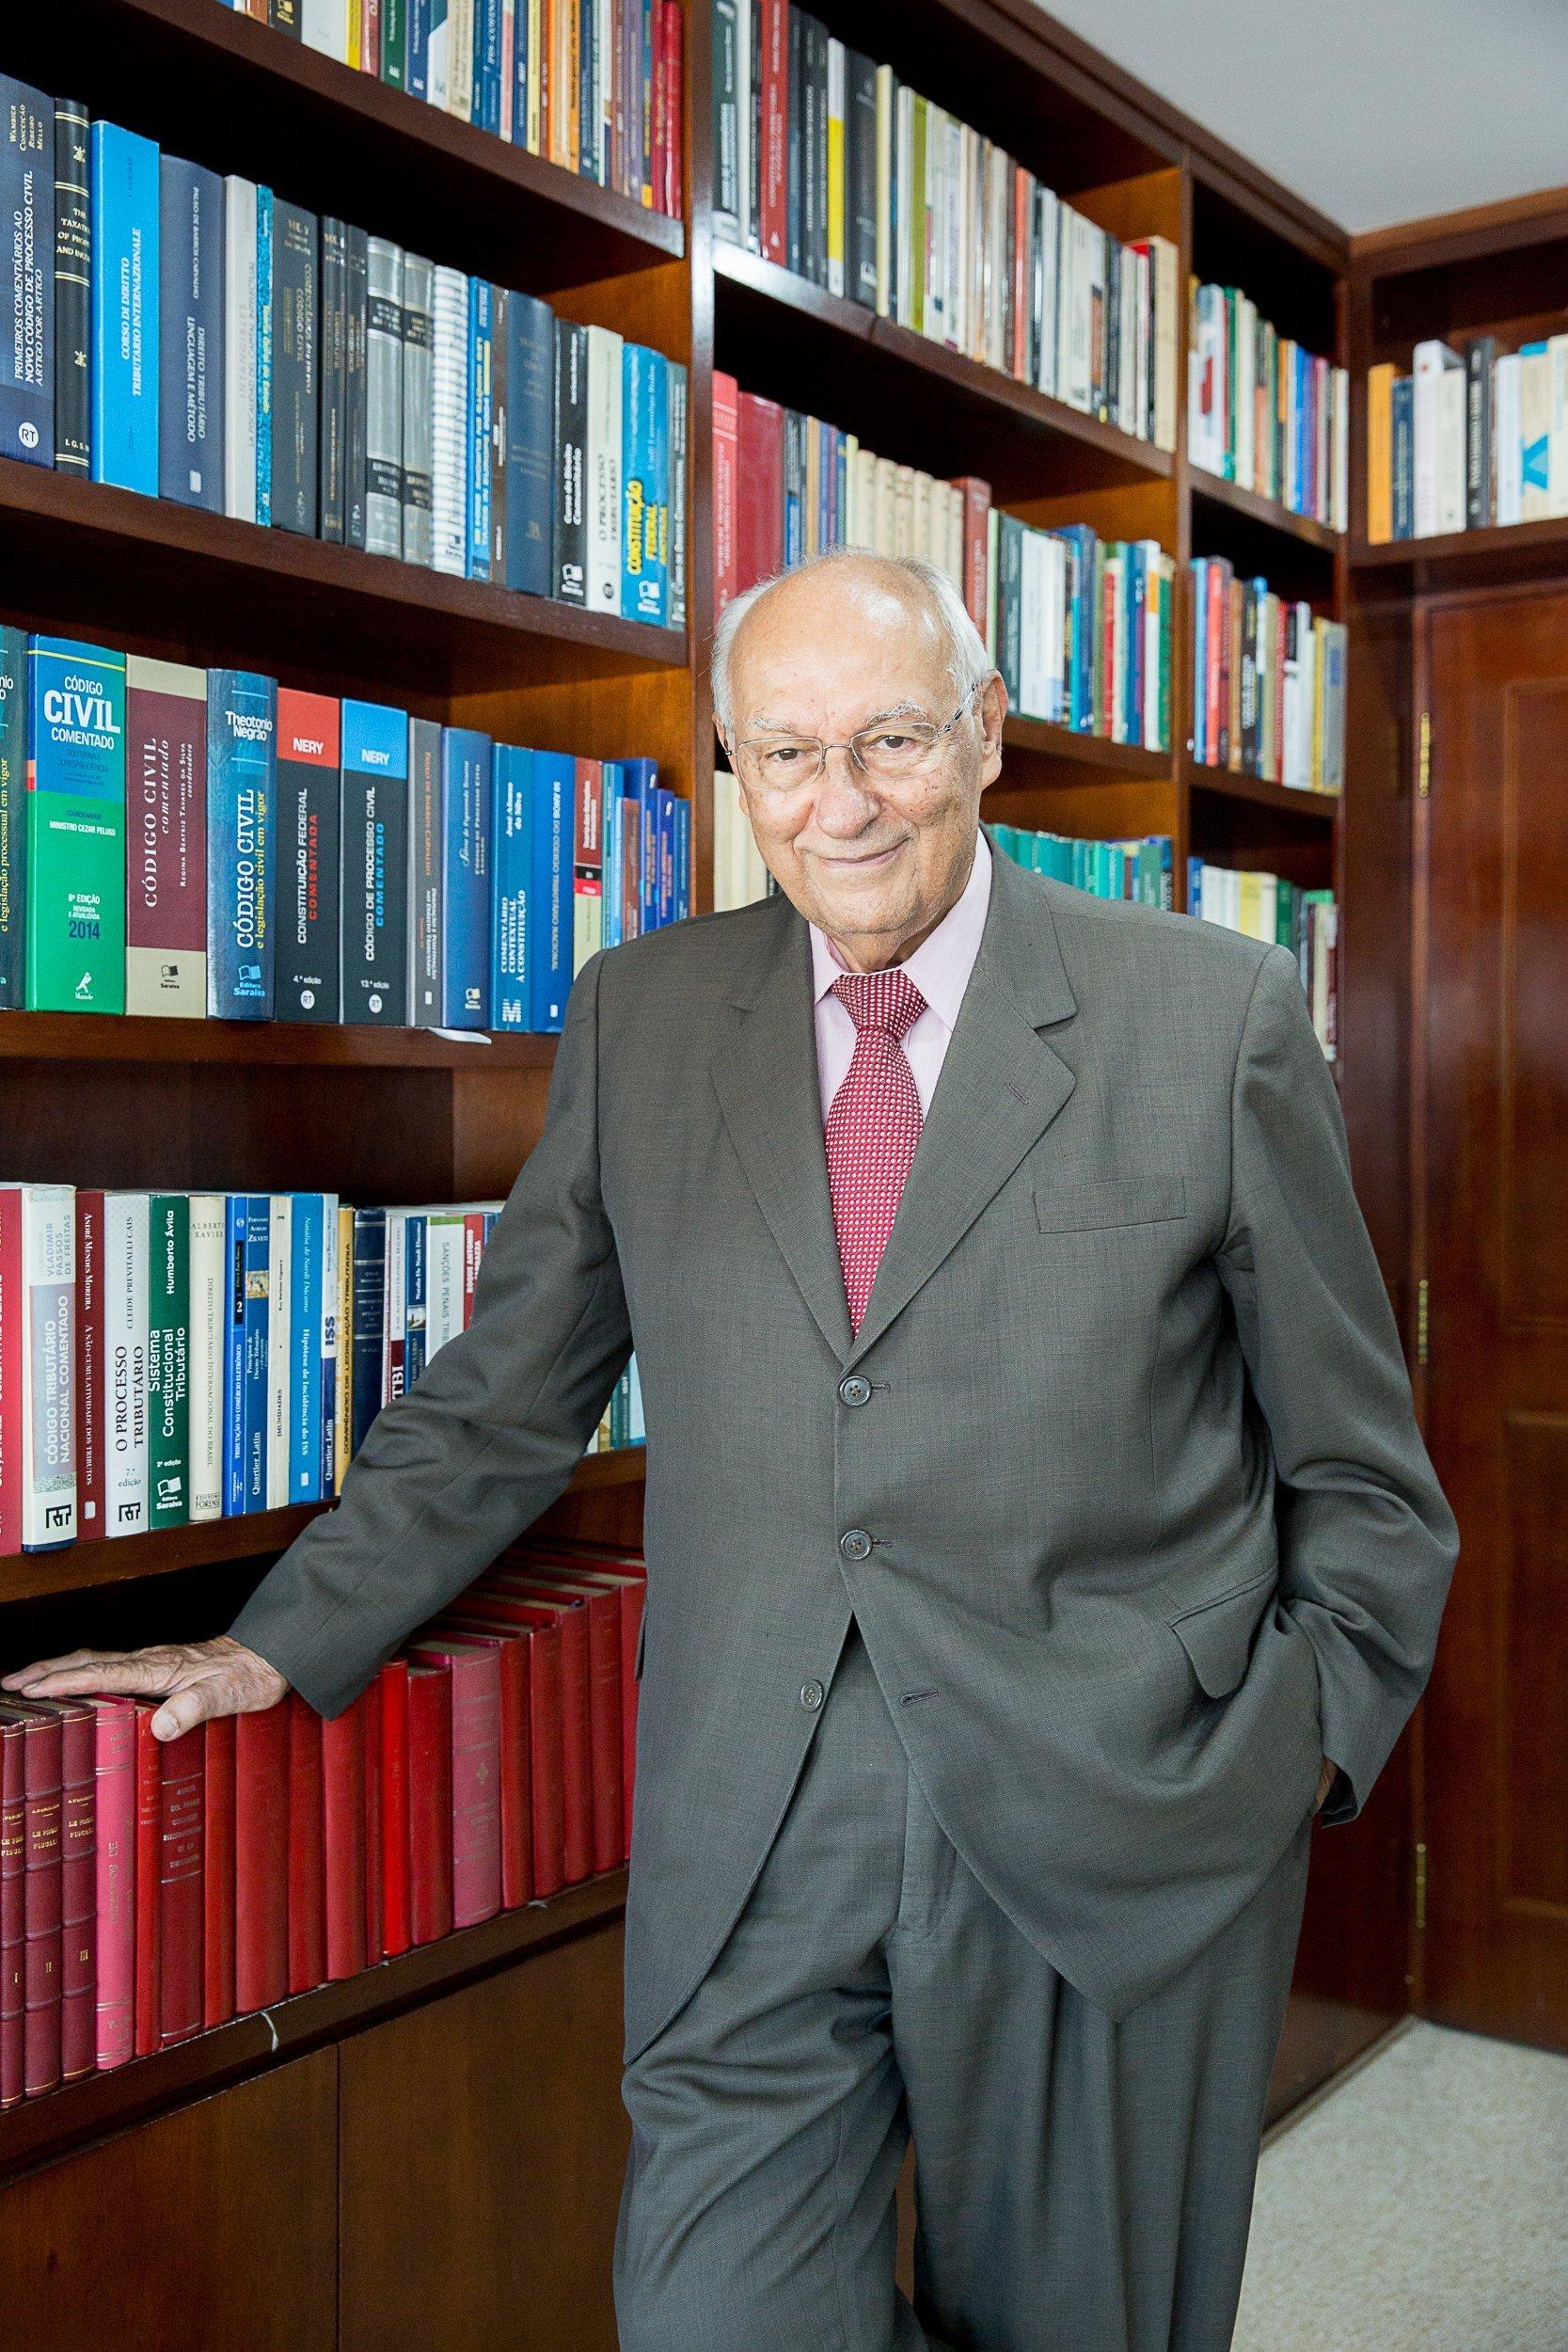 Palestra sobre Conjuntura Nacional no Brasil